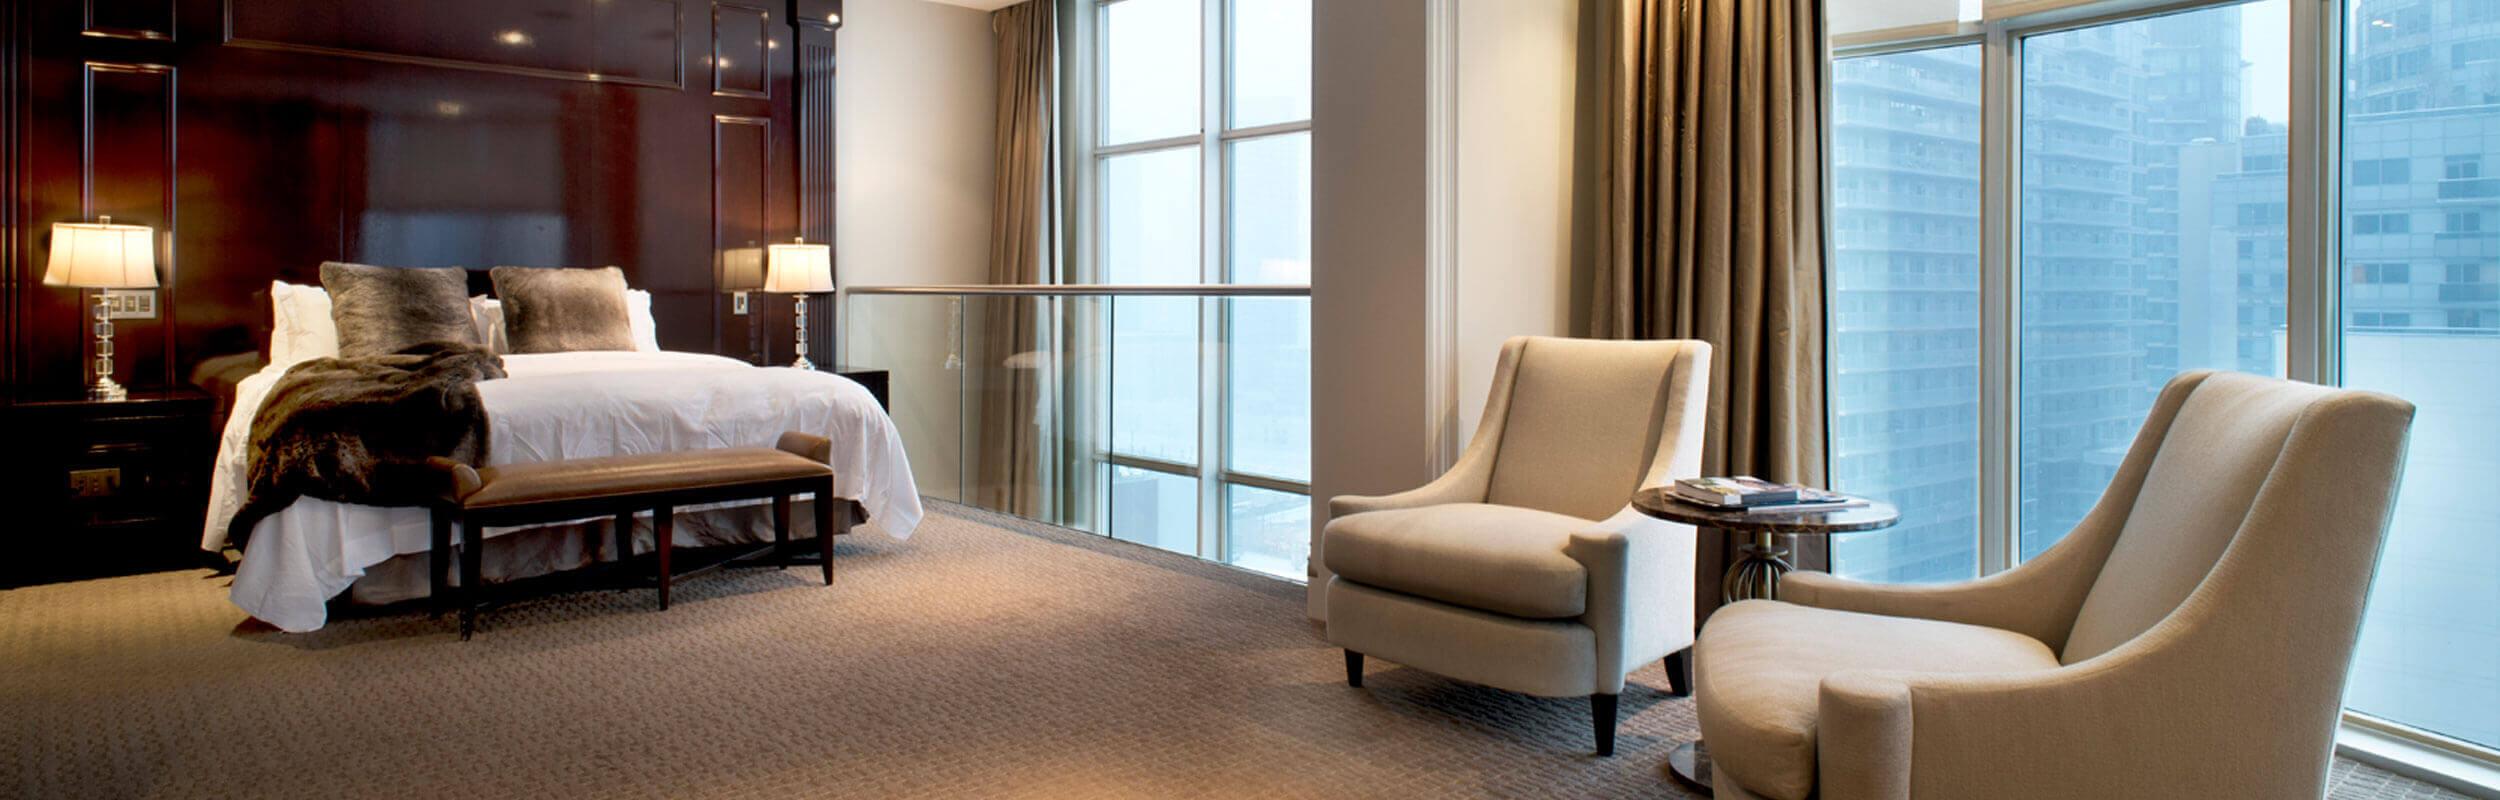 SoHo Hotel Penthouse second floor bedroom